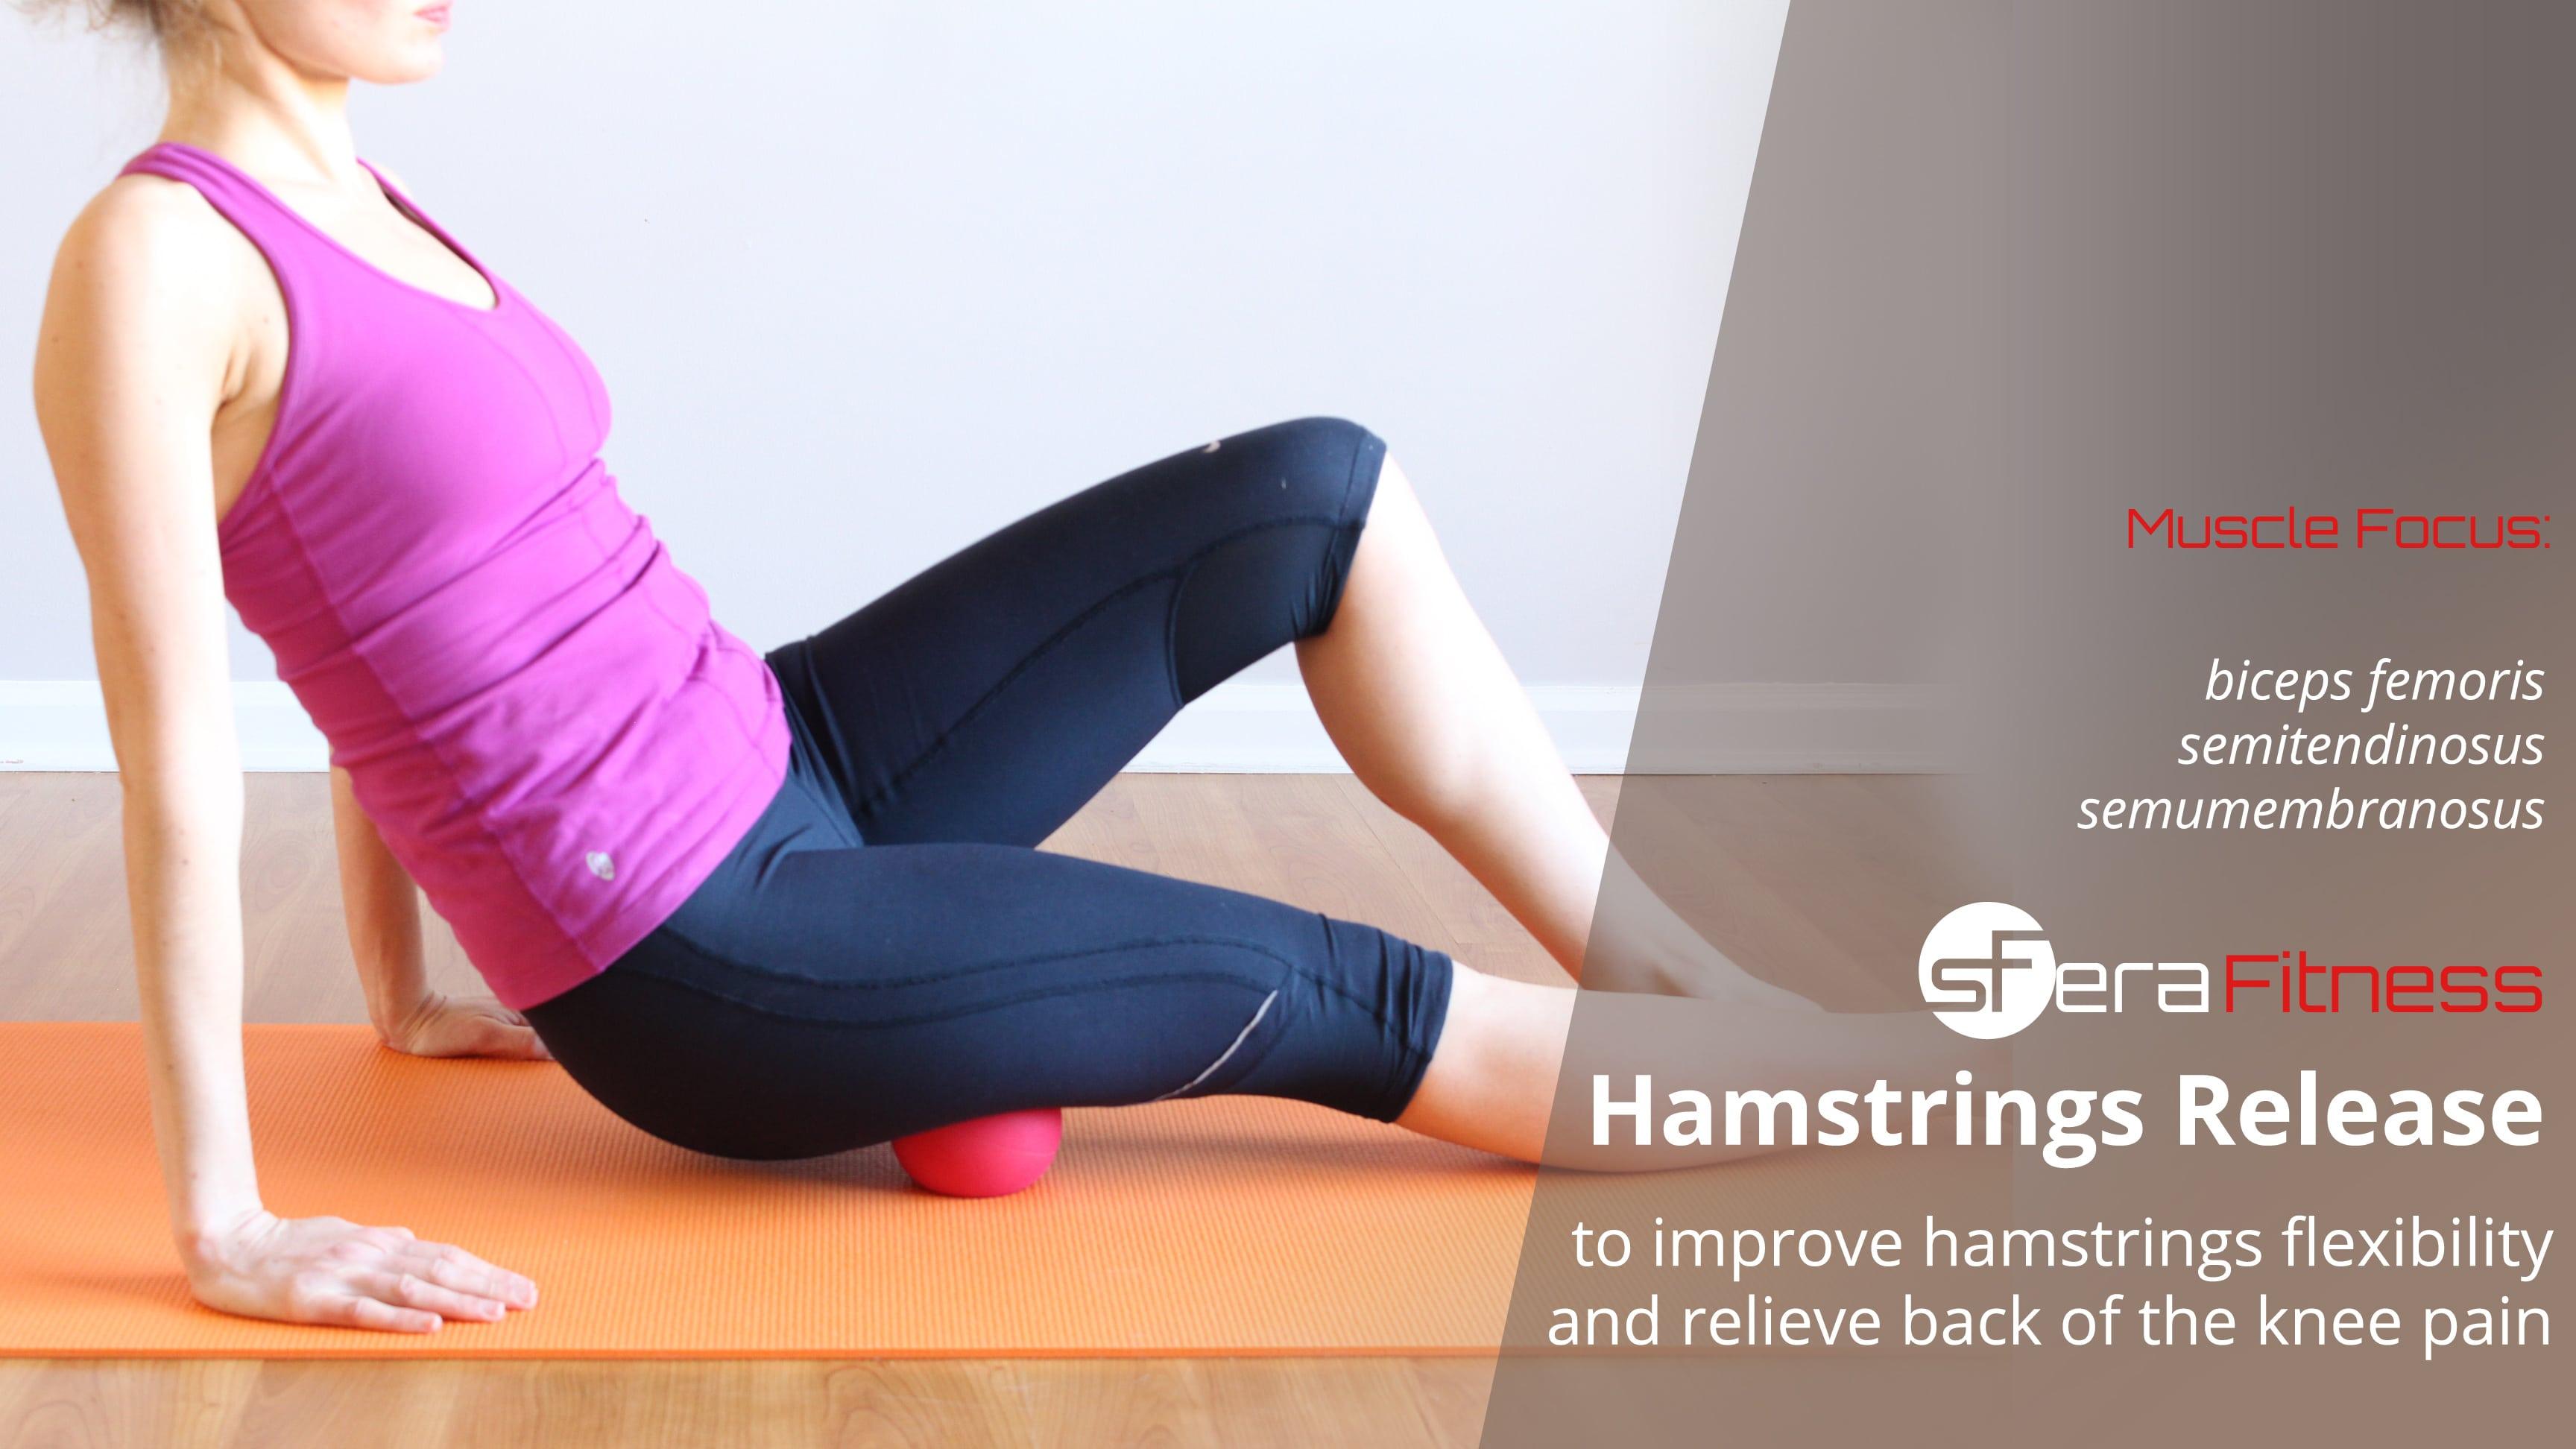 Massage Ball Training Videos | Sfera Fitness